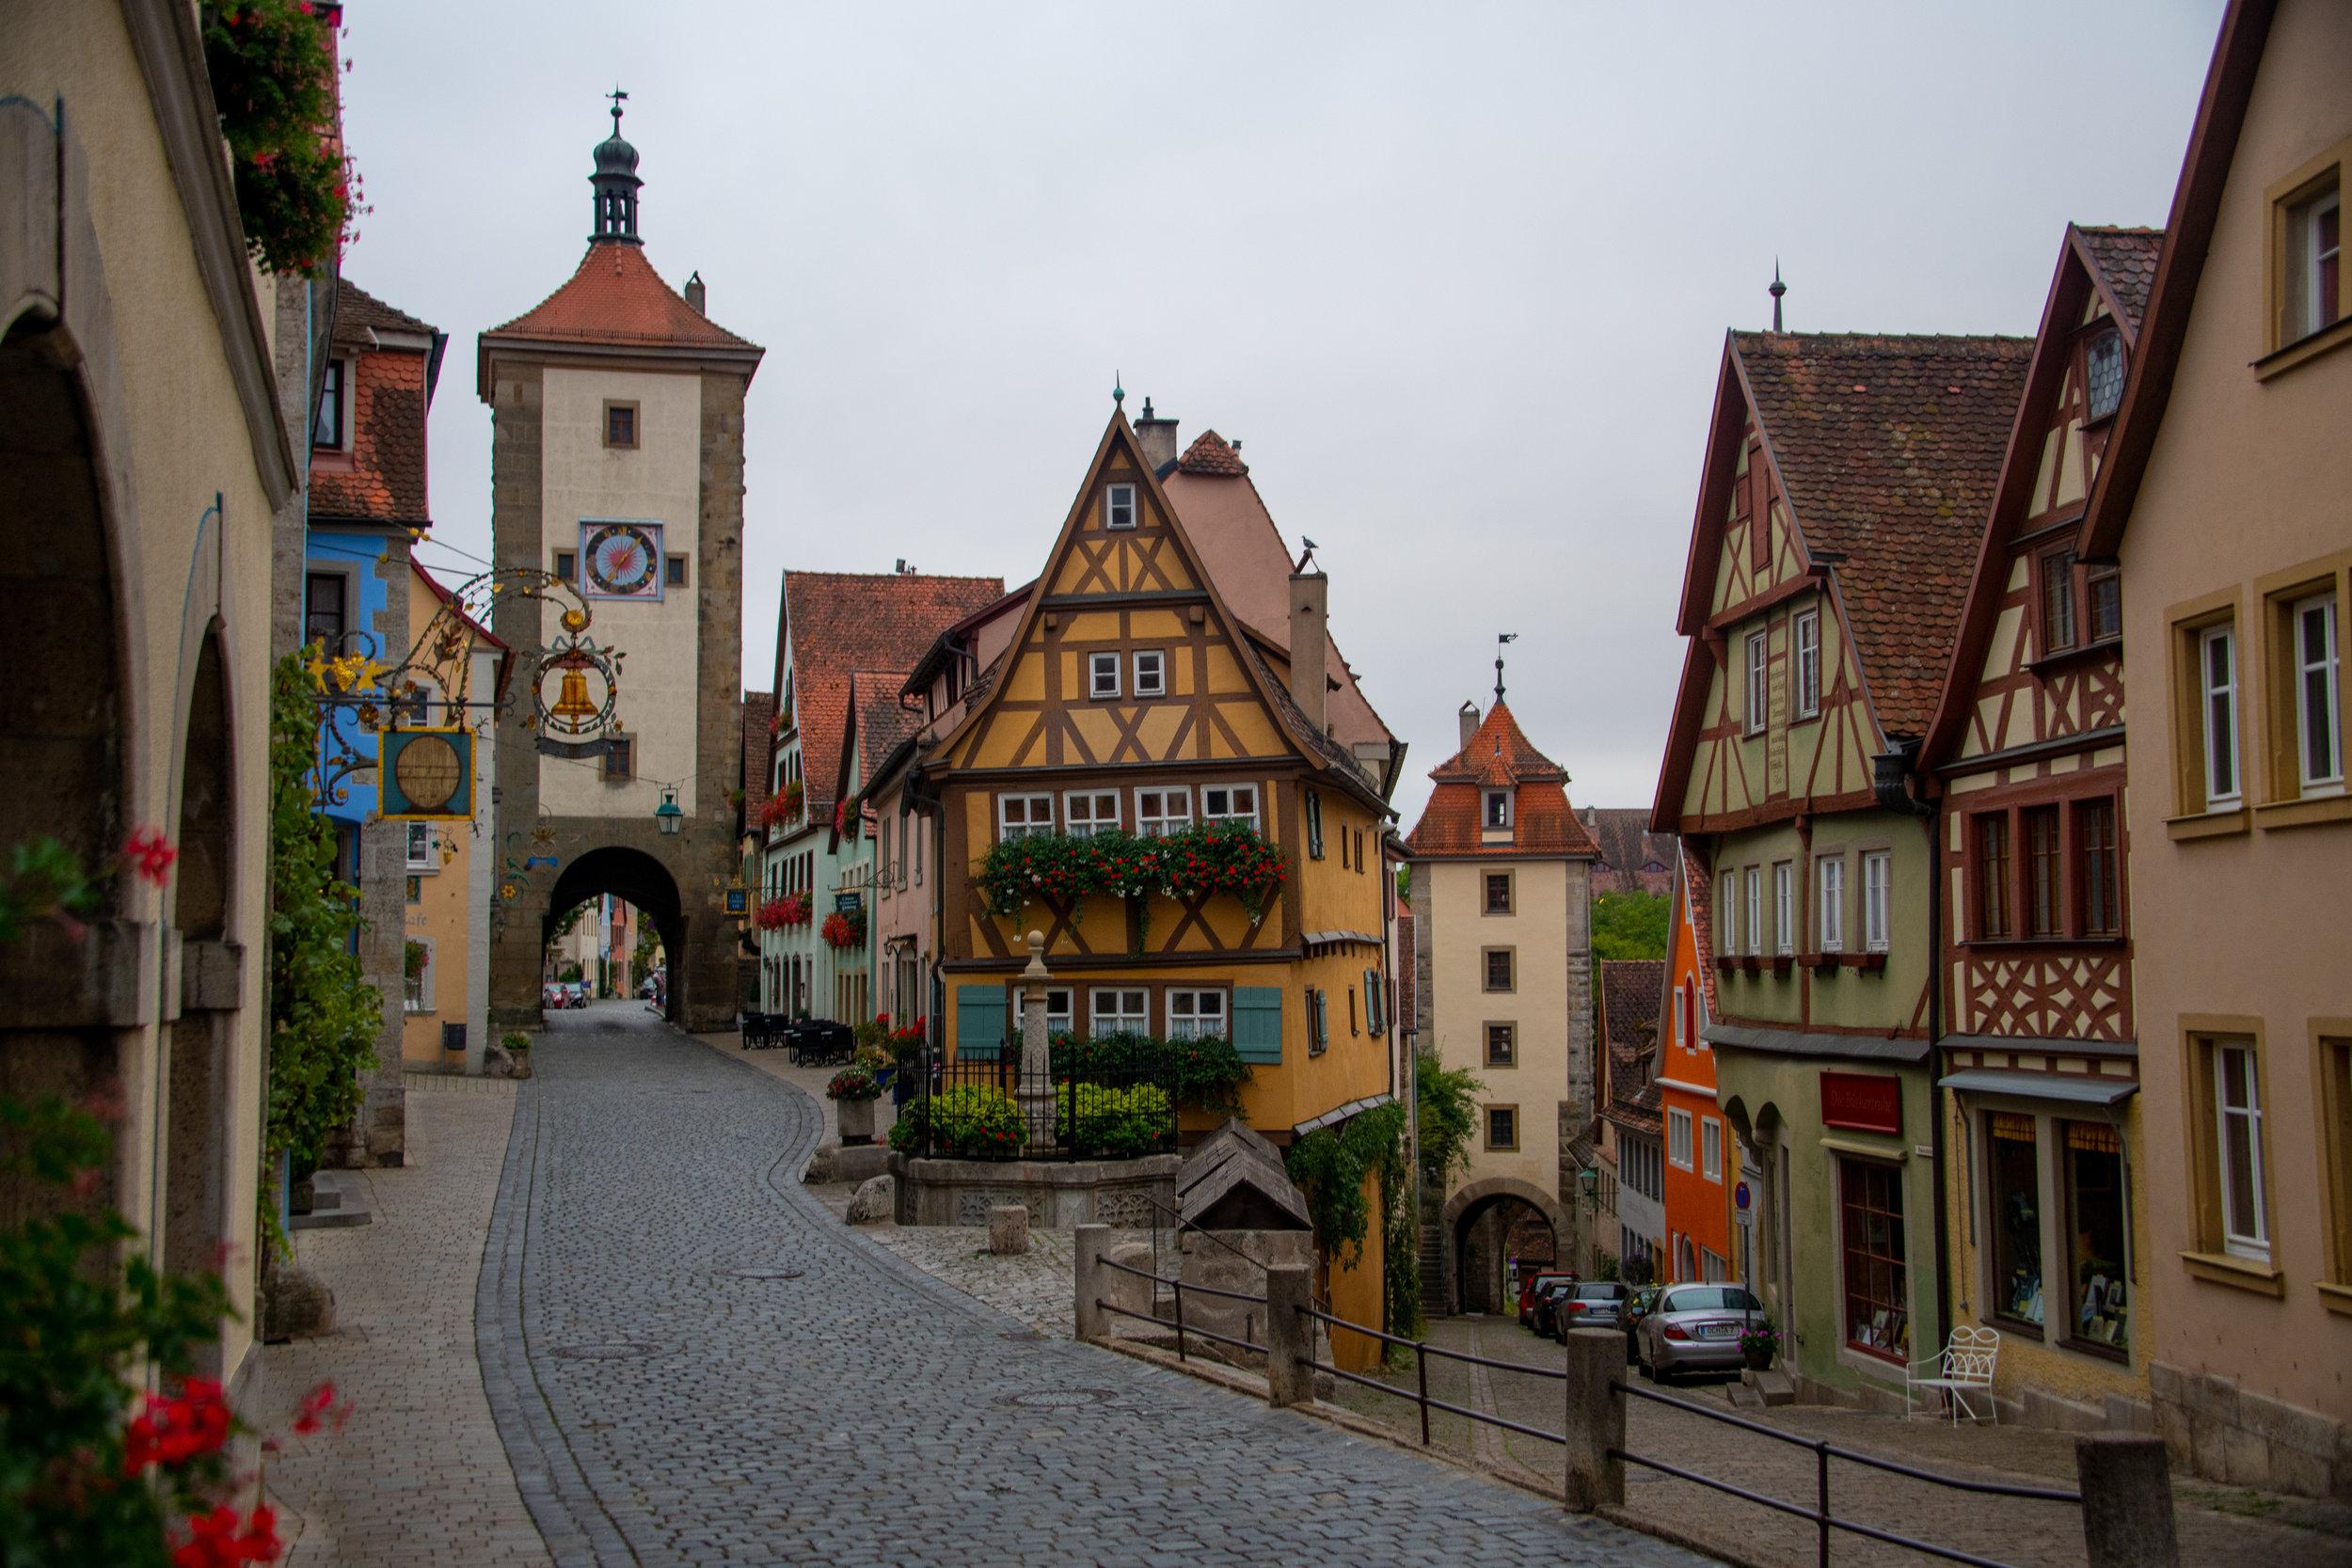 Probably my favorite photo - Rothenburg ob der Tauber, Germany